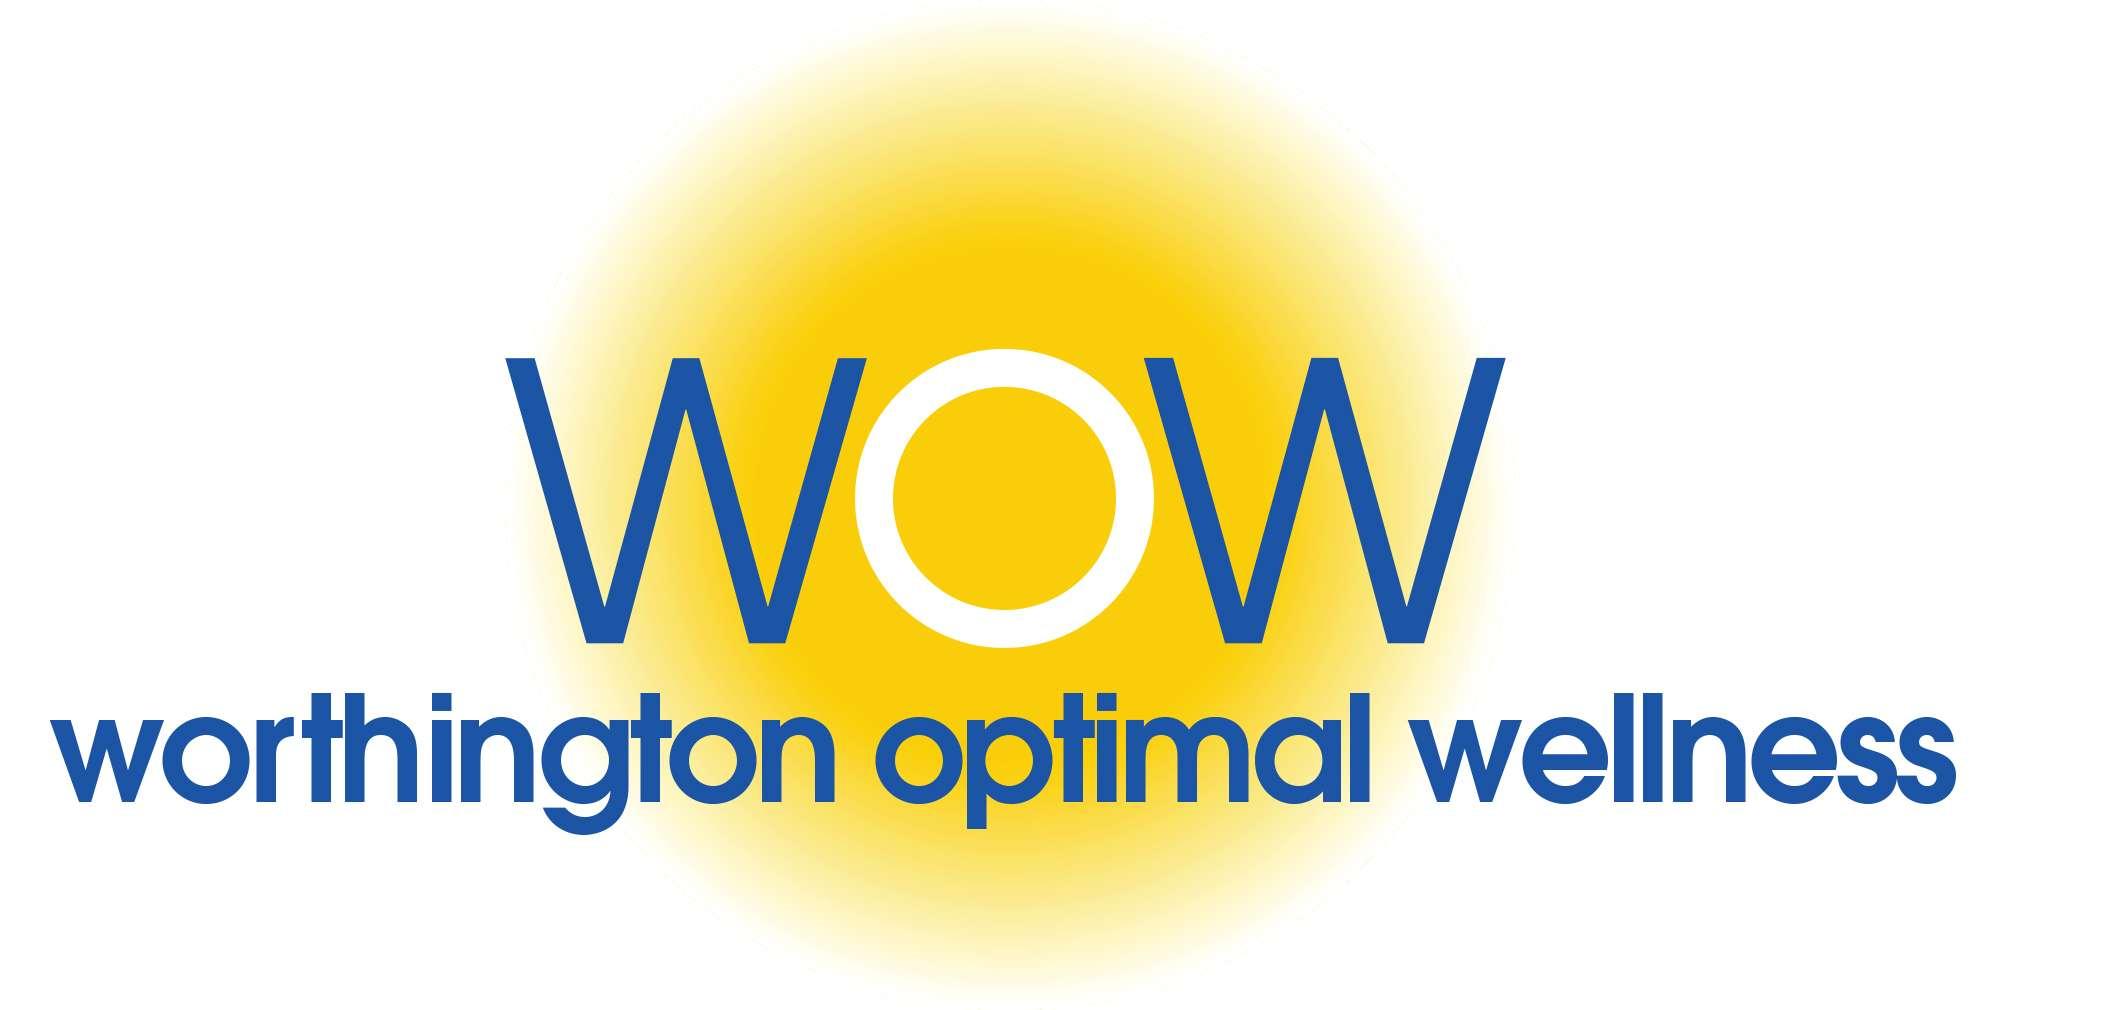 Worthington Optimal Wellness